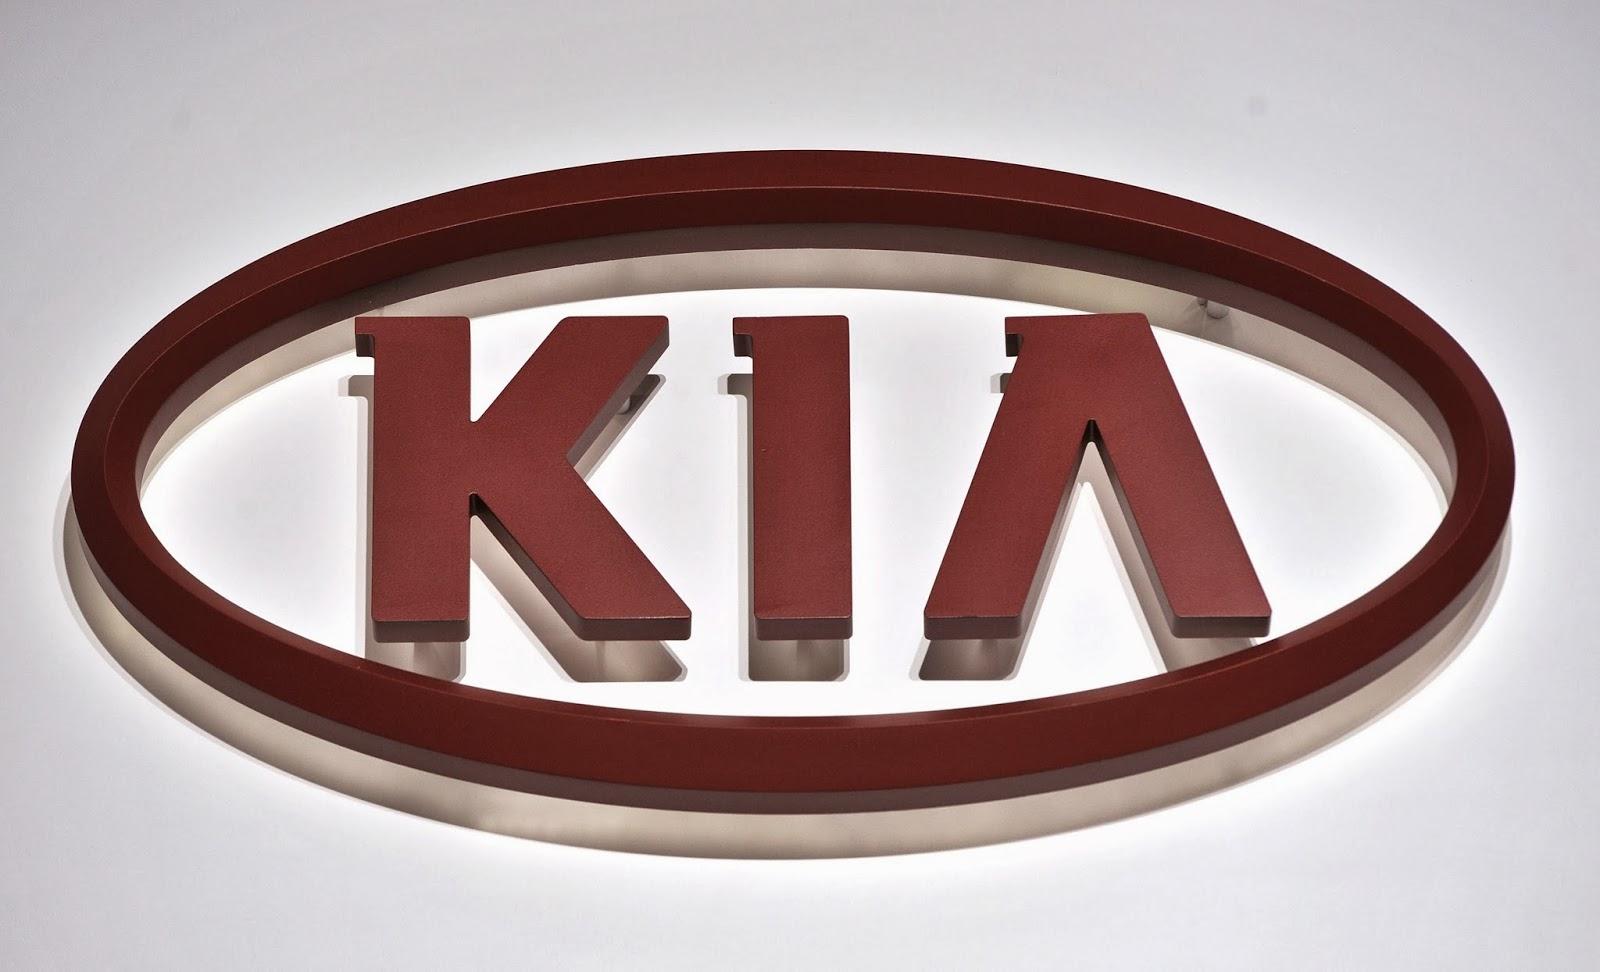 Kia Logo Kia Car Symbol Meaning And History Car Brand Names Com